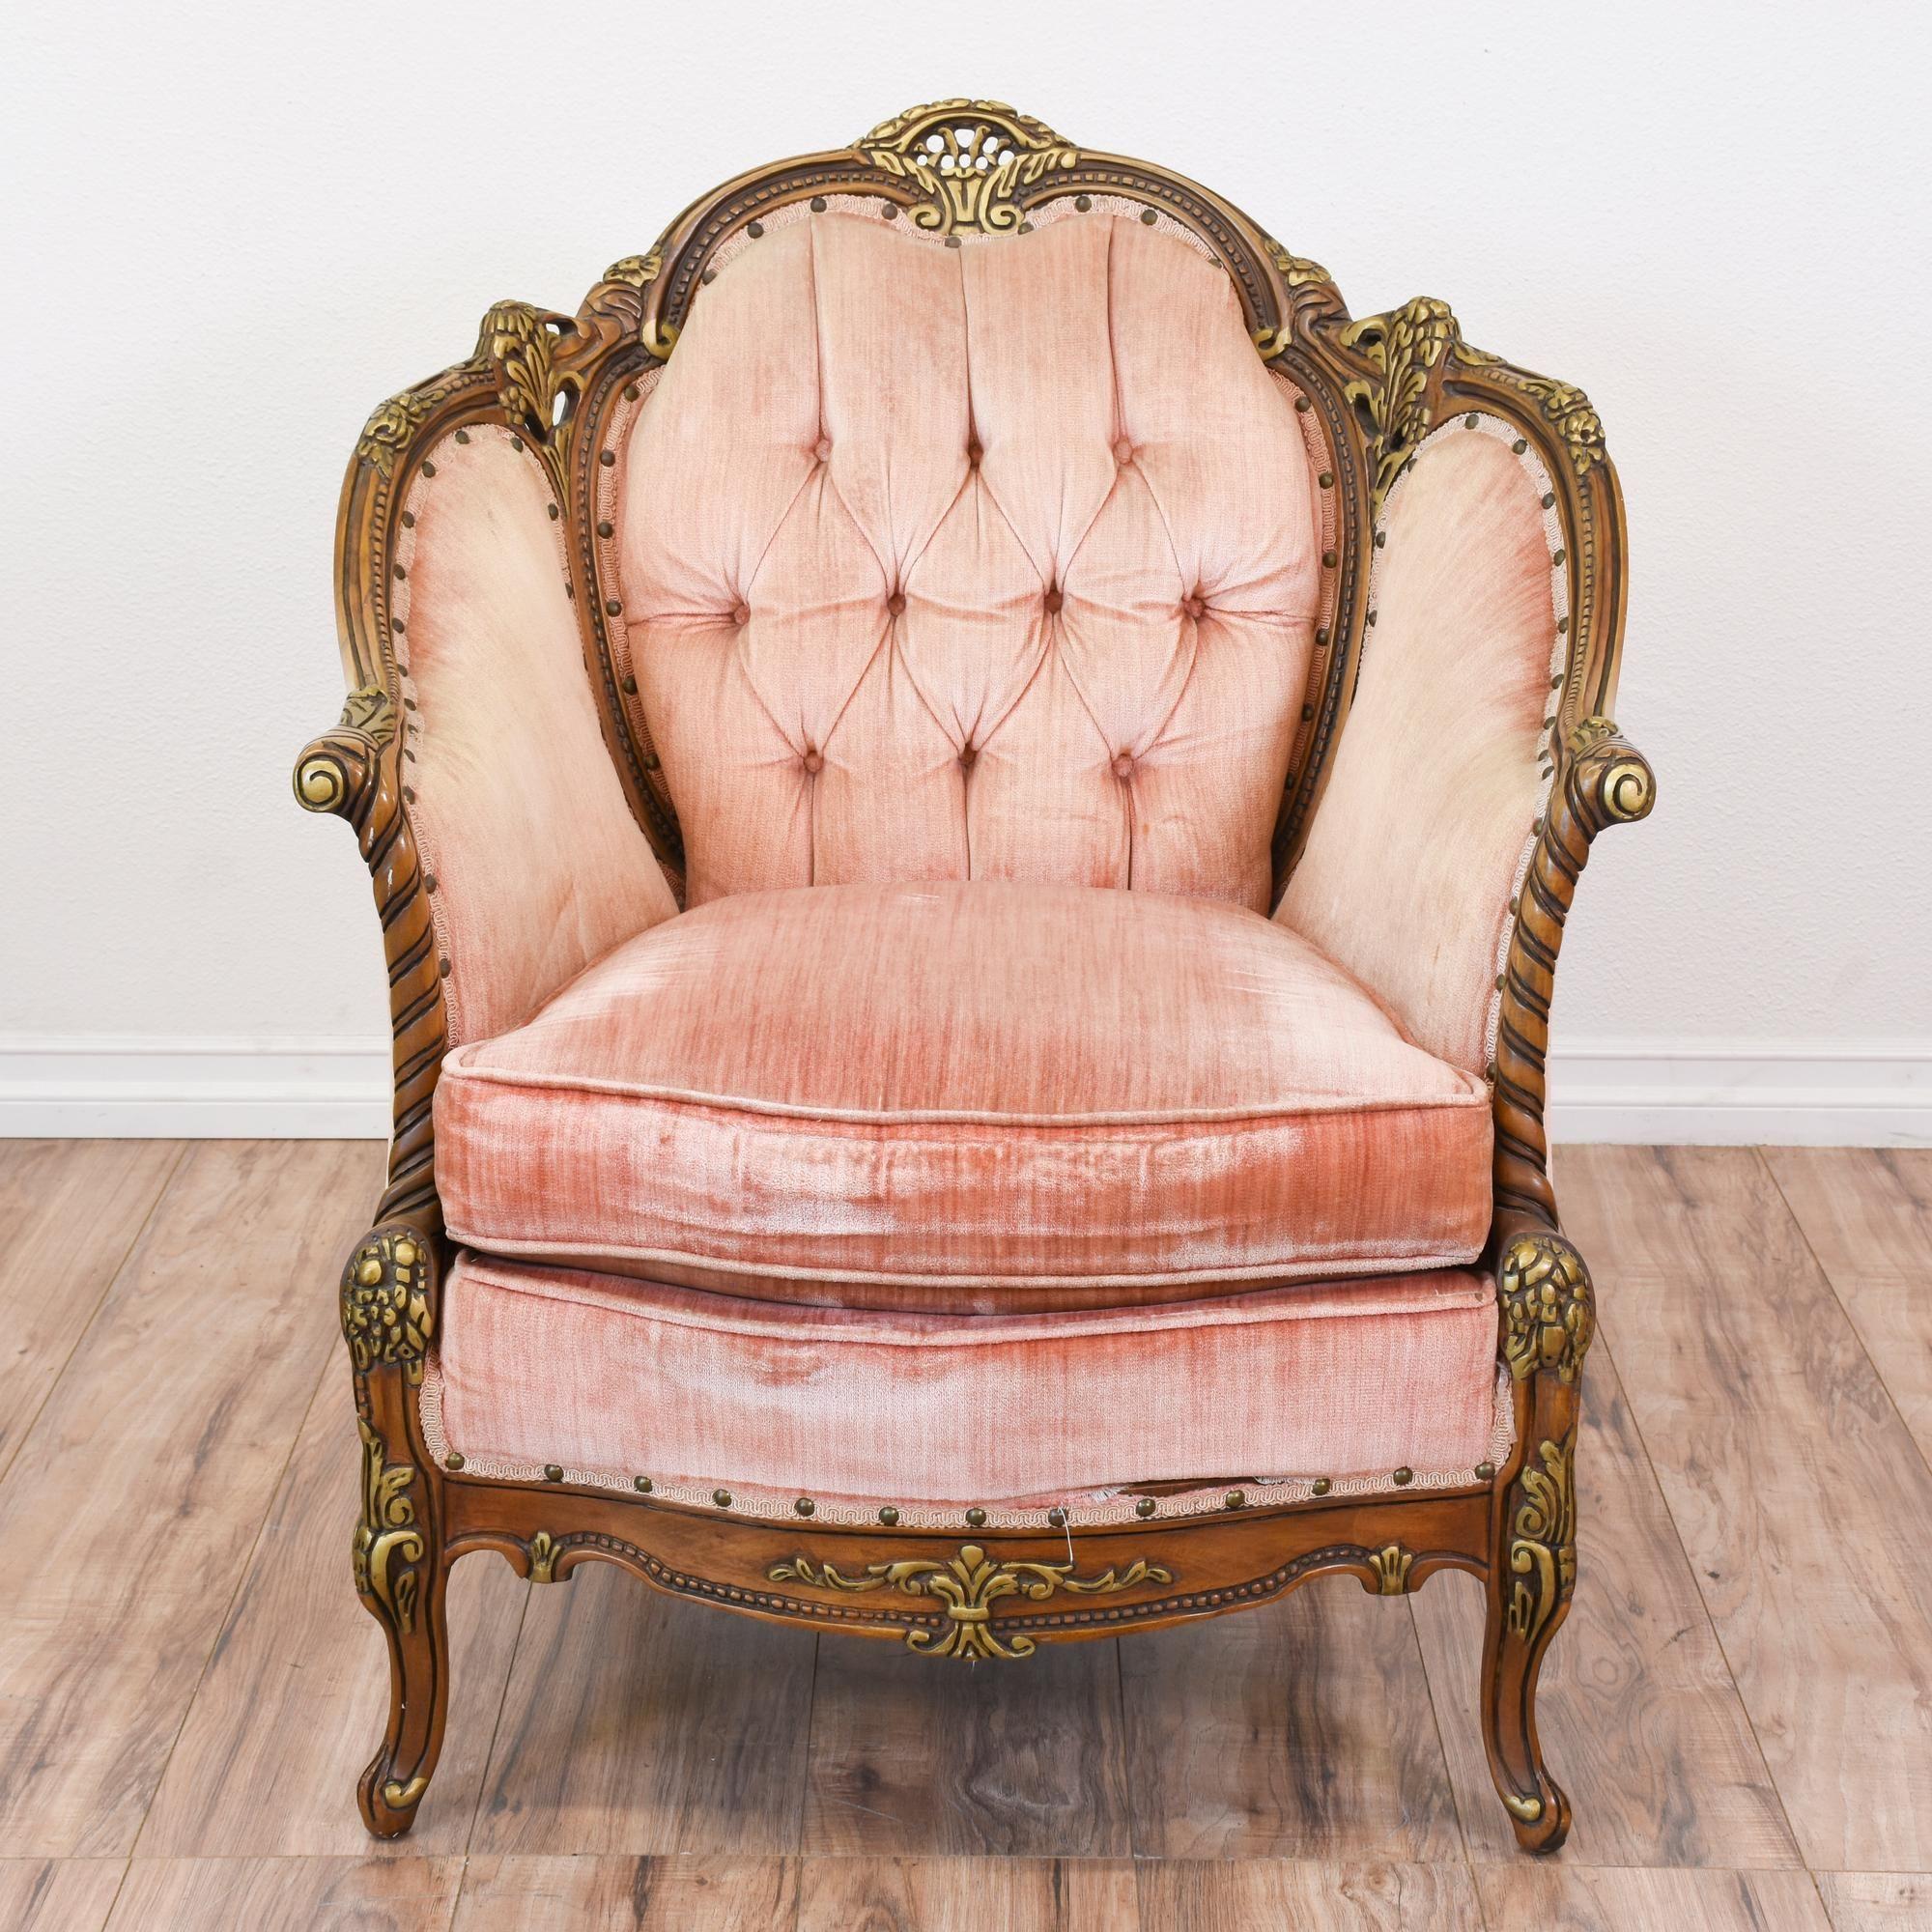 Antique velvet chair -  Chateau Chambord Rococo Pink Velvet Armchair